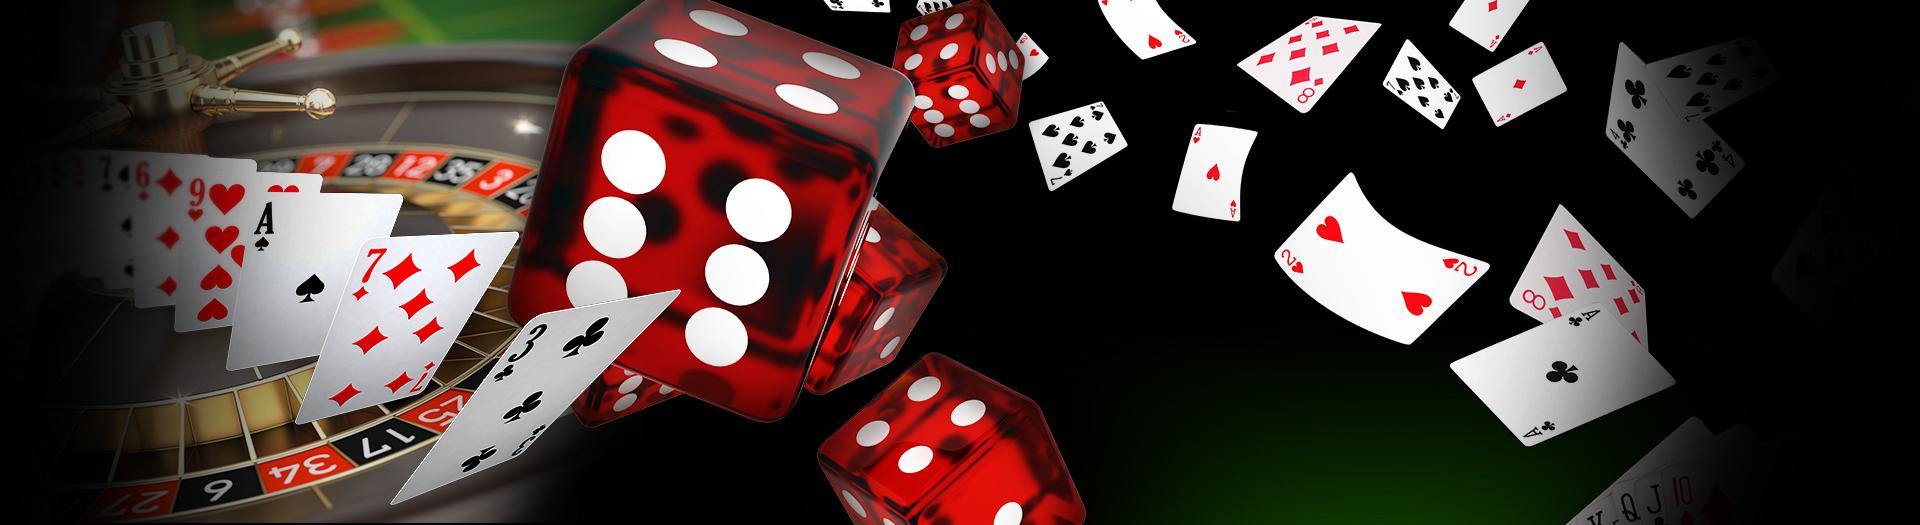 Casino regala DINERO 888 promotions 76857